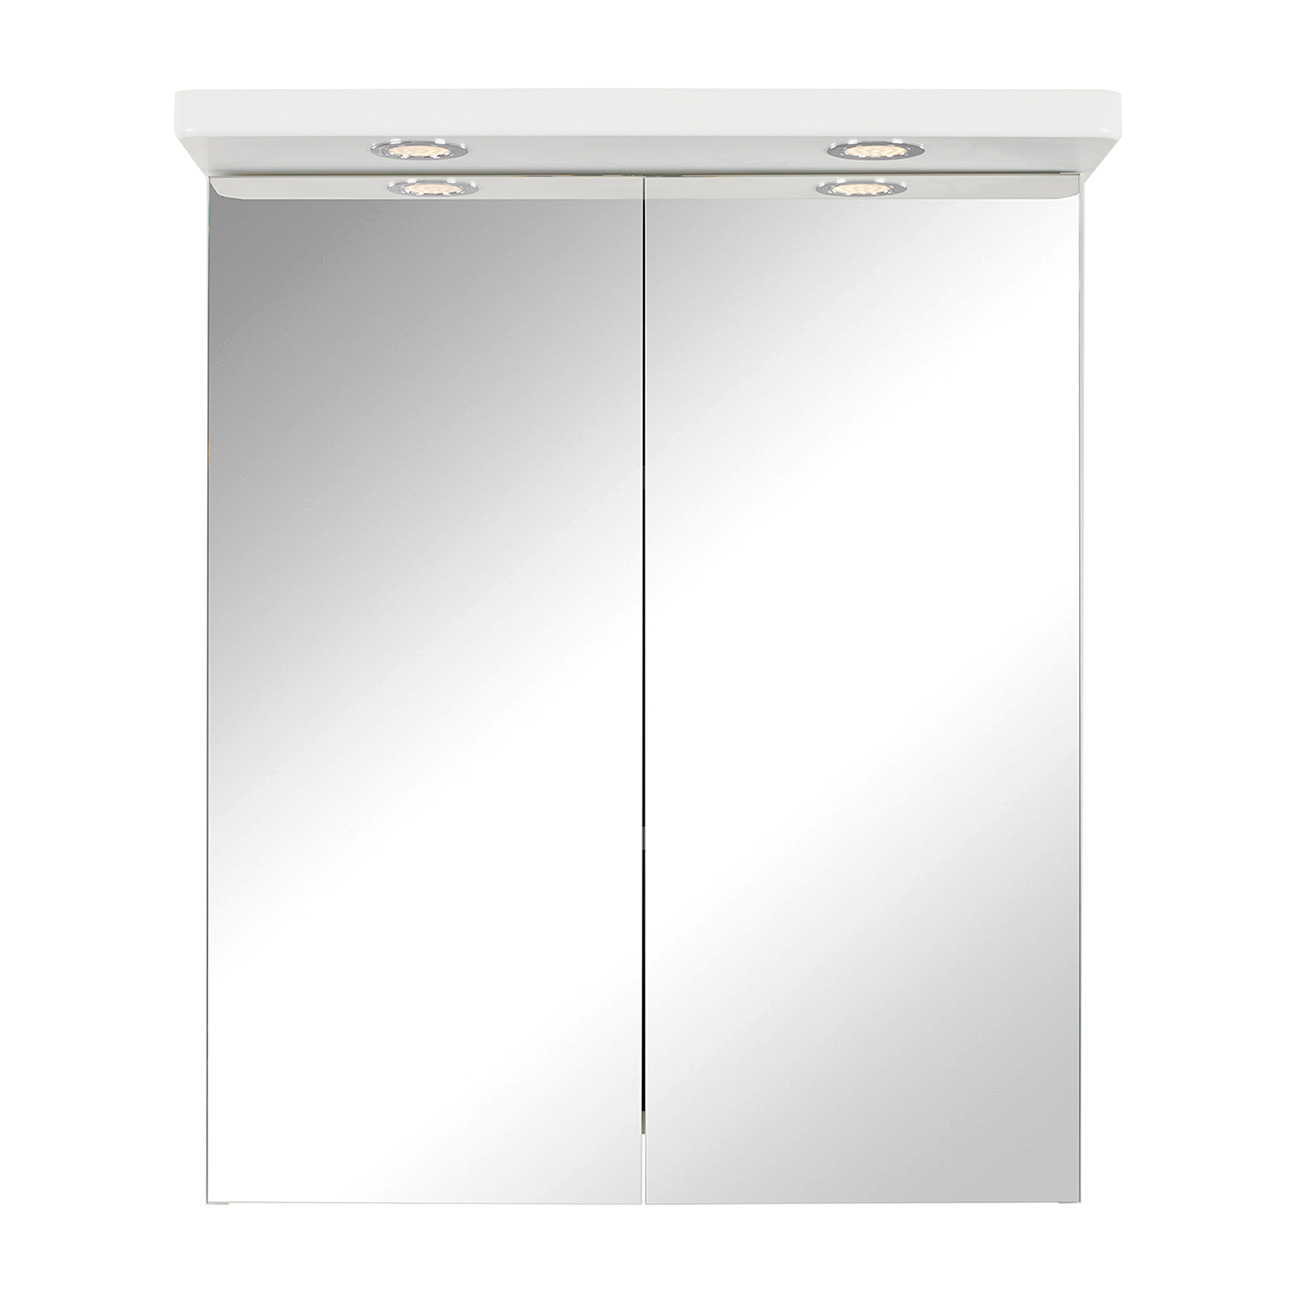 Spegelskåp Arredo Spirit 60